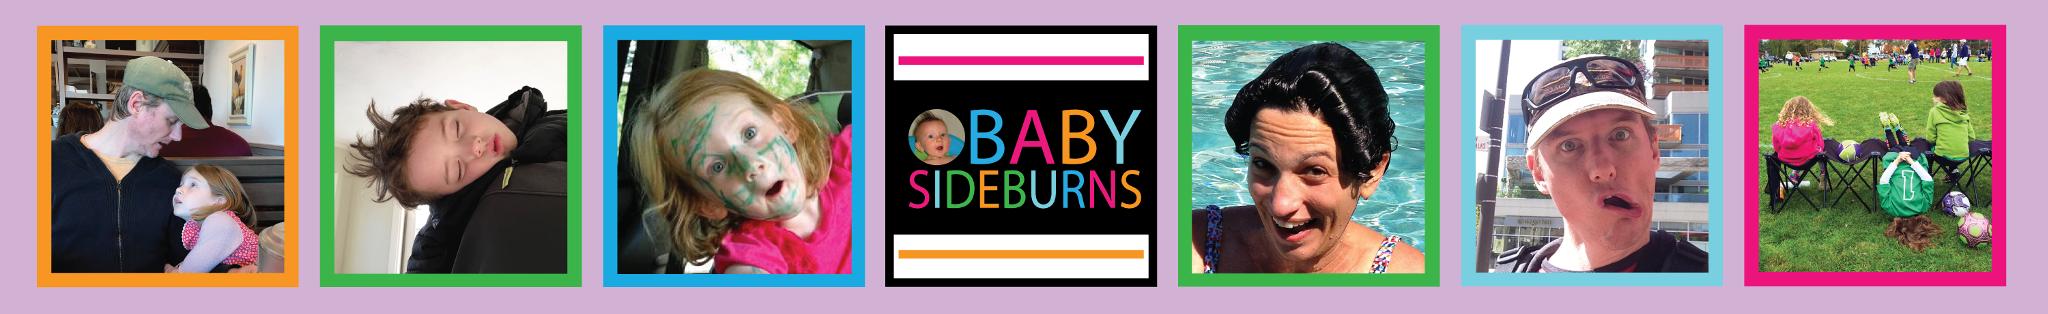 Baby Sideburns